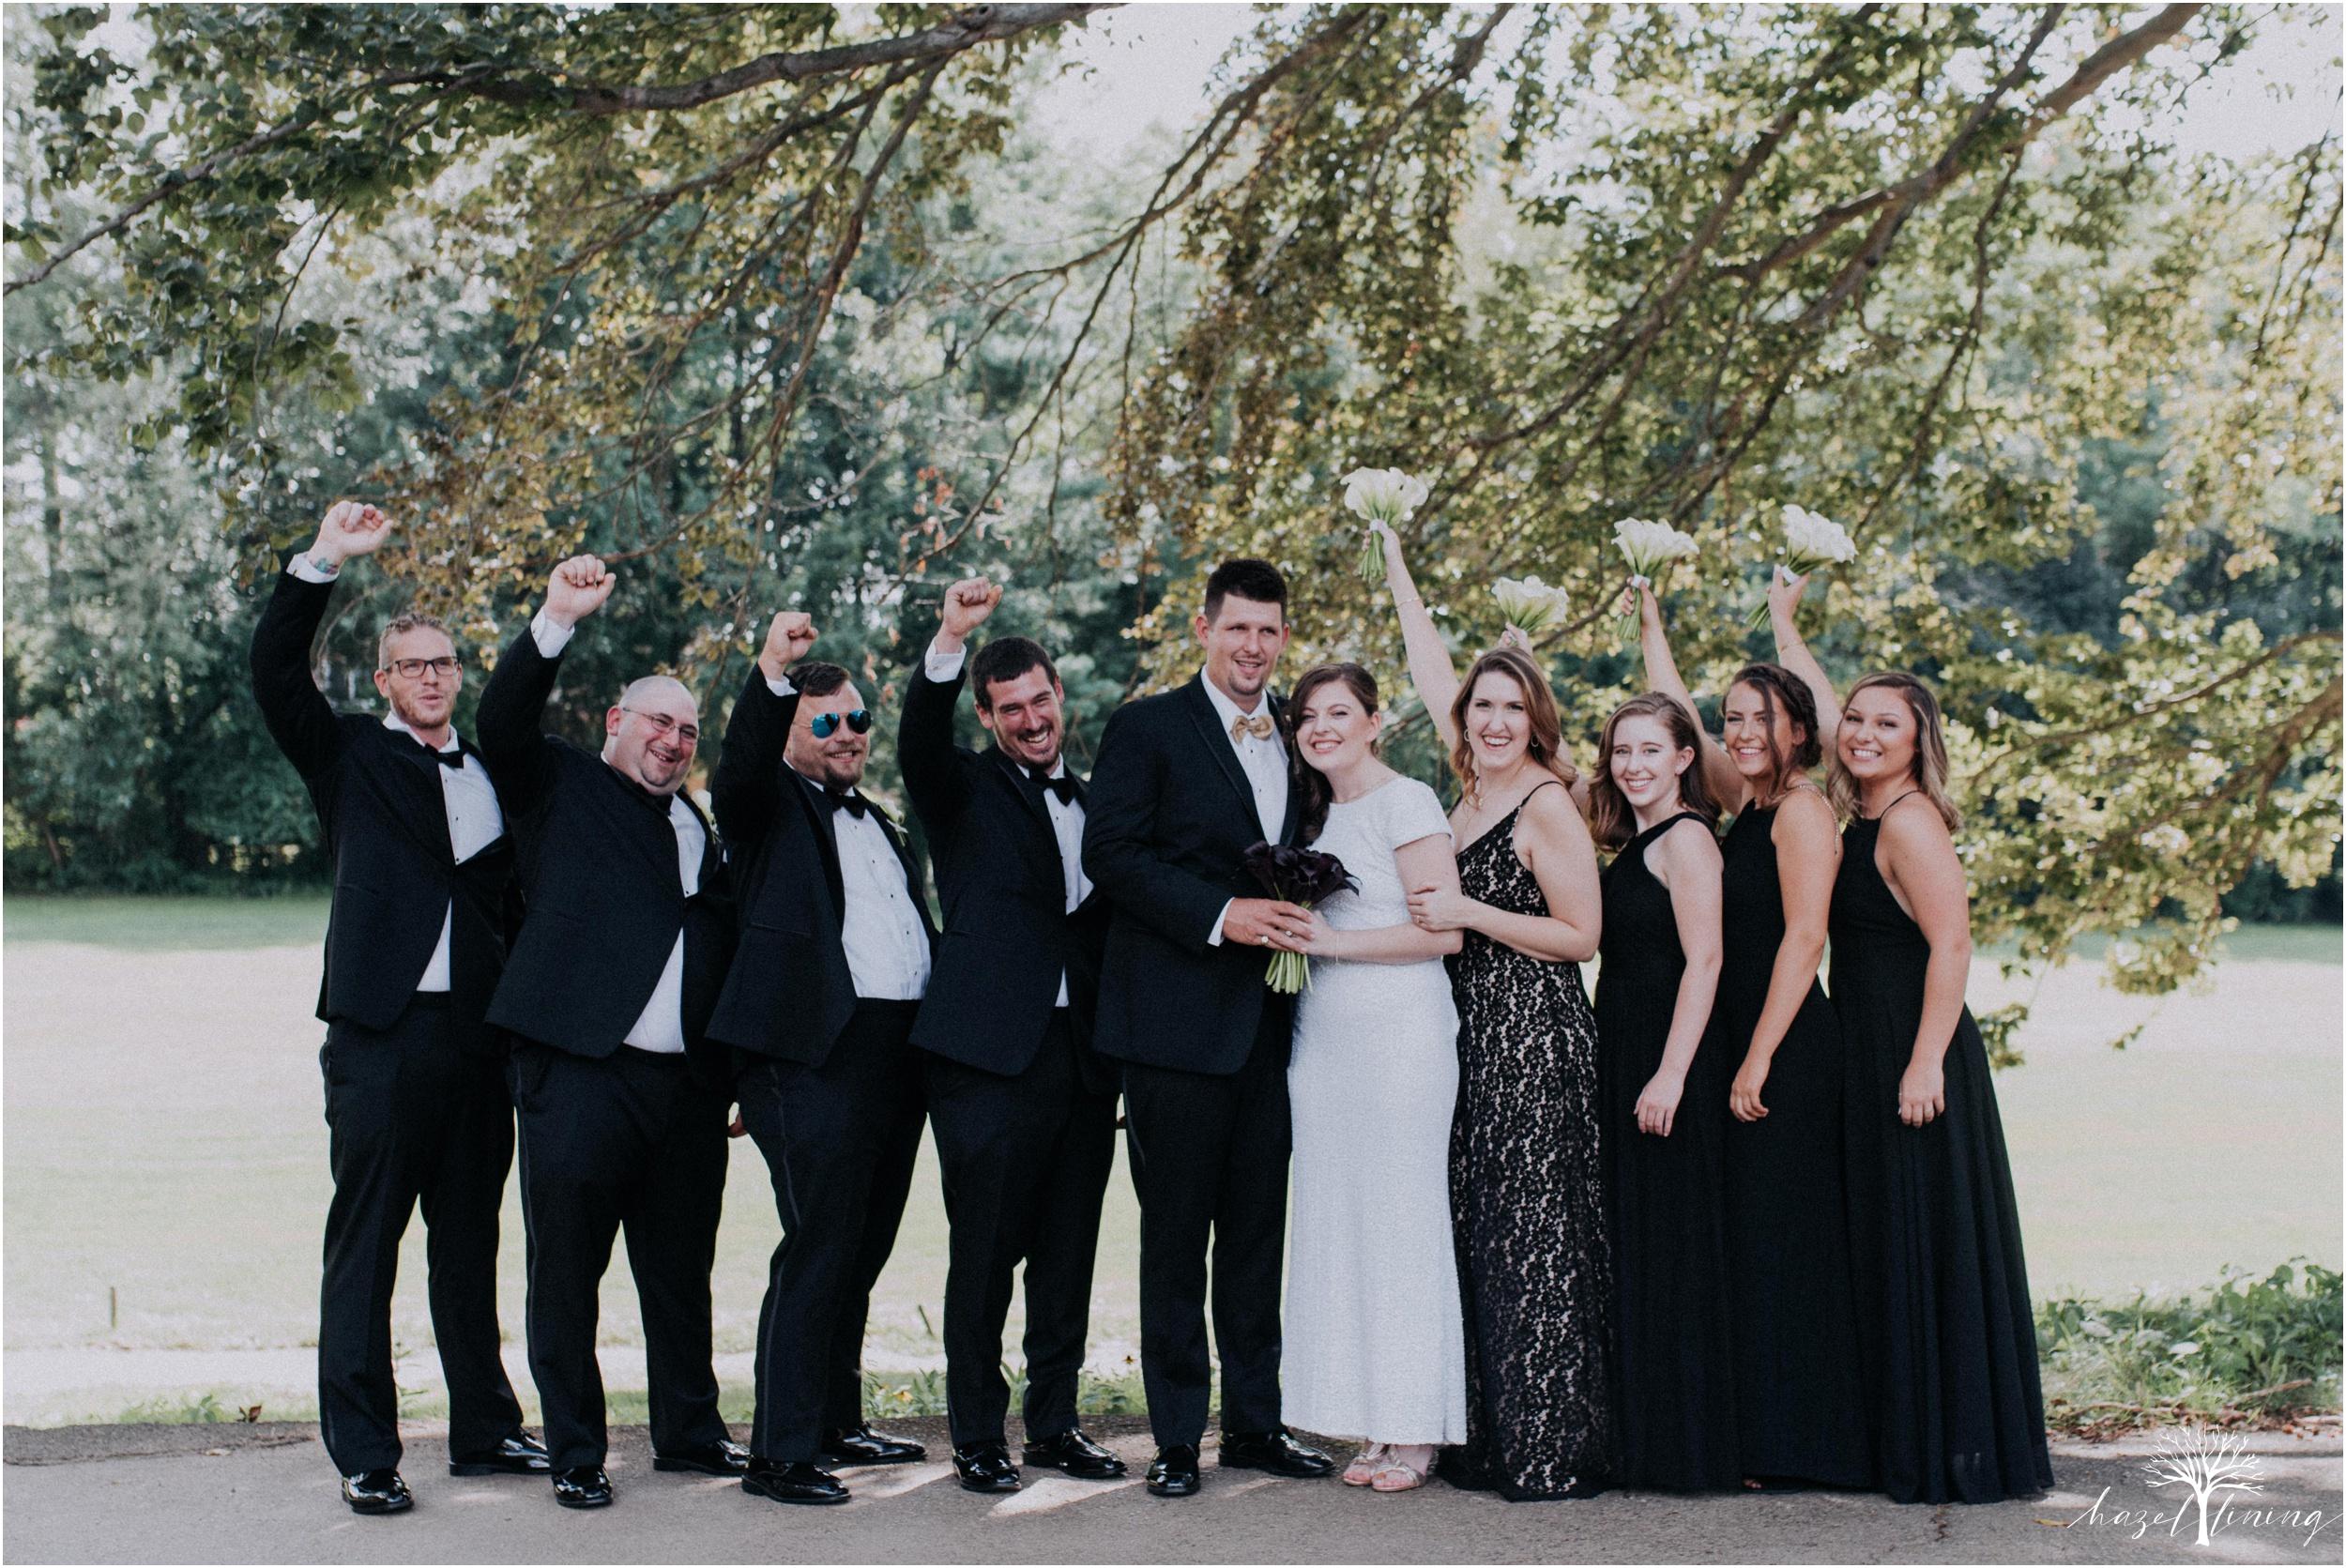 elizabeth-doelp-andrew-foreback-middletown-country-club-summer-langhorne-pennsylvania-wedding-hazel-lining-travel-wedding-elopement-photography_0049.jpg